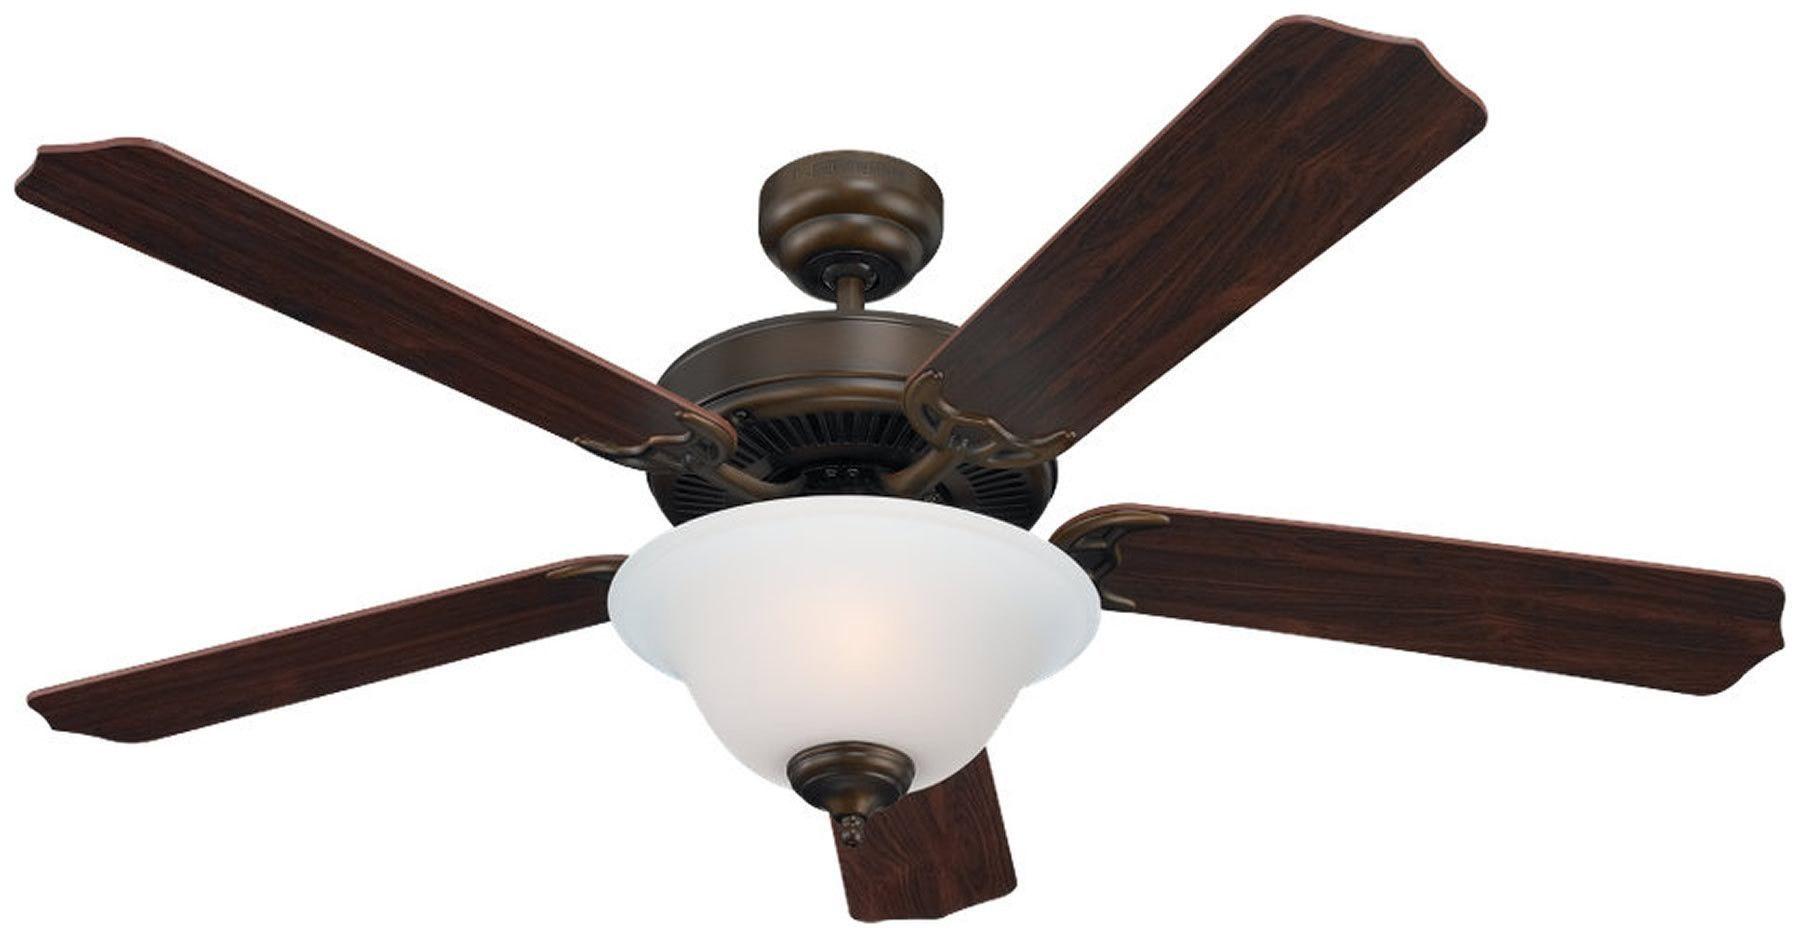 0-004651>Quality Max Plus 2-Light Fluorescent Energy Star Indoor Ceiling Fan Russet Bronze